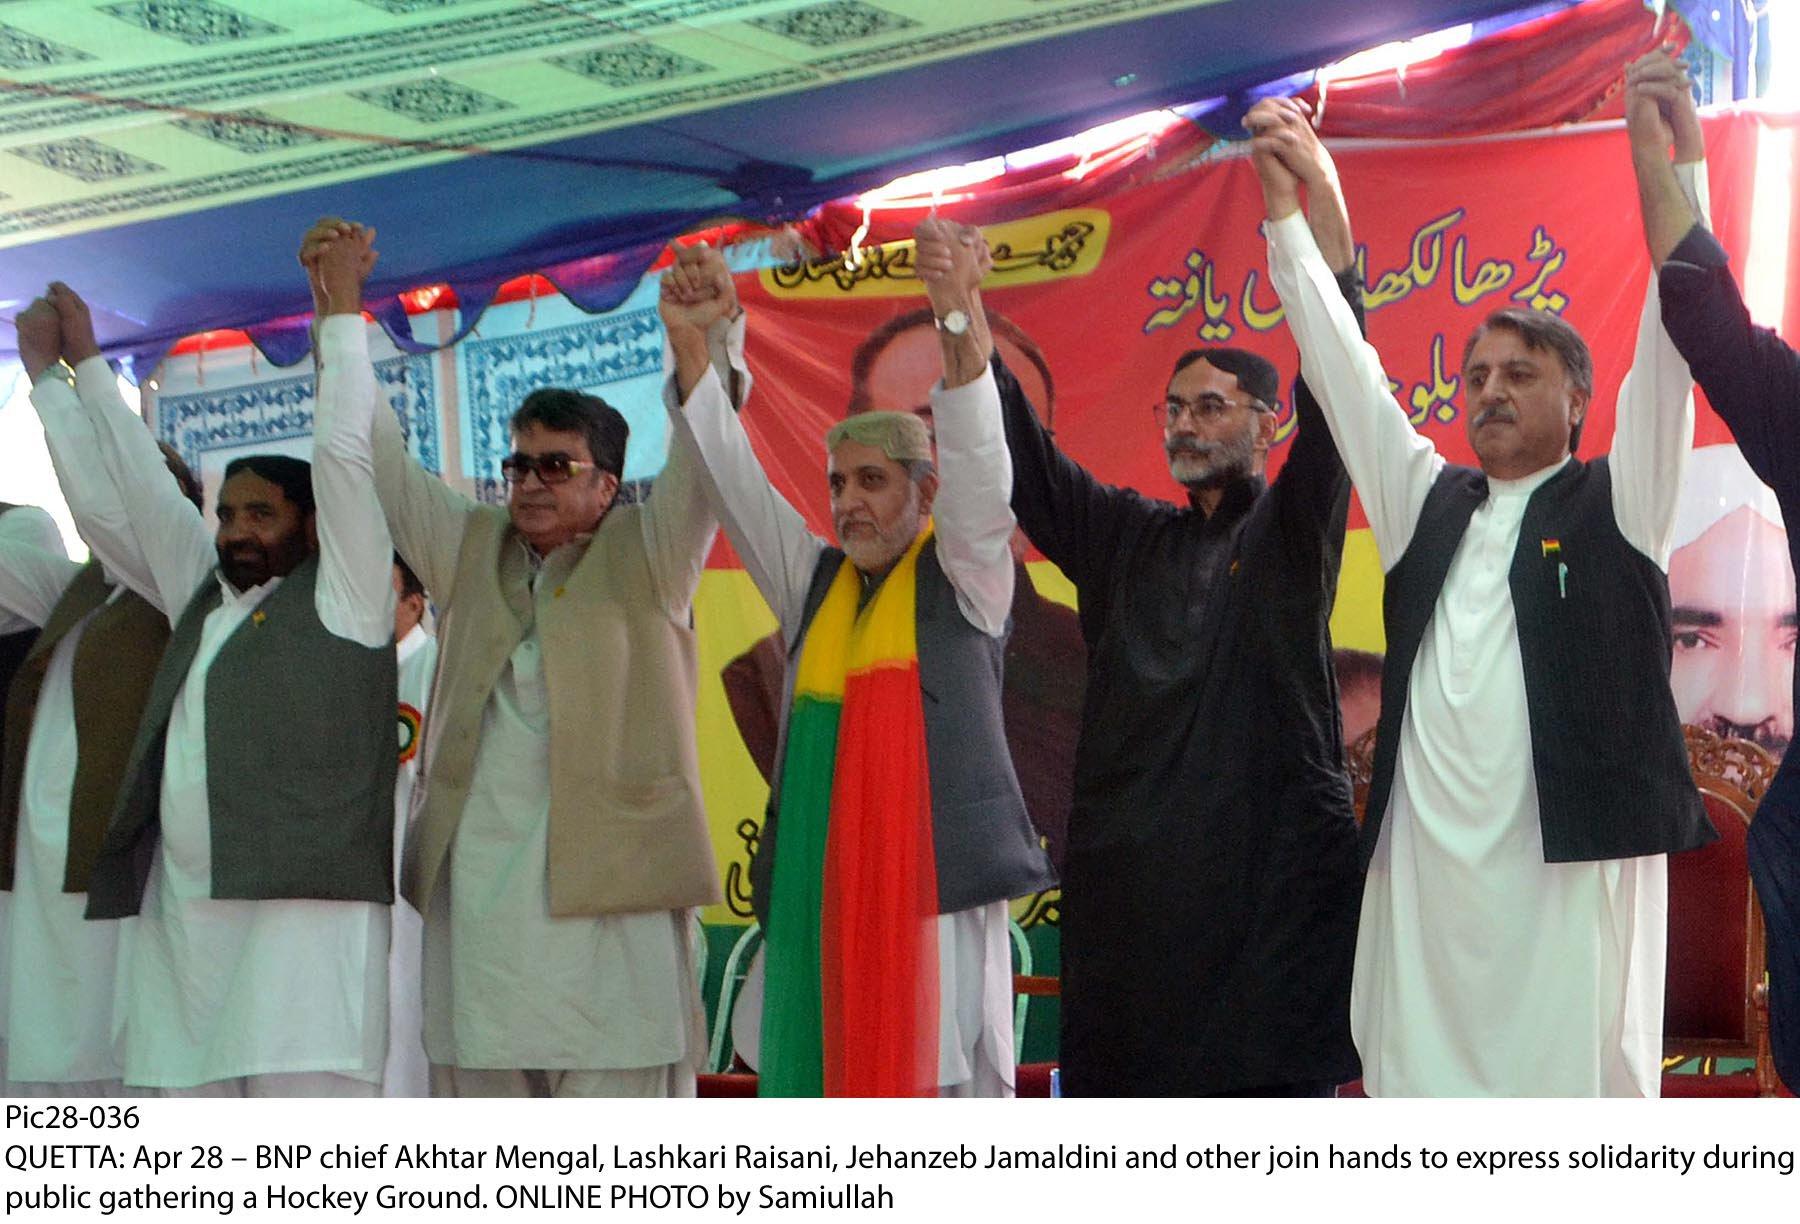 BNP-M chief Sardar Akhtar Mengal, Lashkari Raisani, Jehanzeb Jamaldini and others join hands to express solidarity. PHOTO: ONLINE